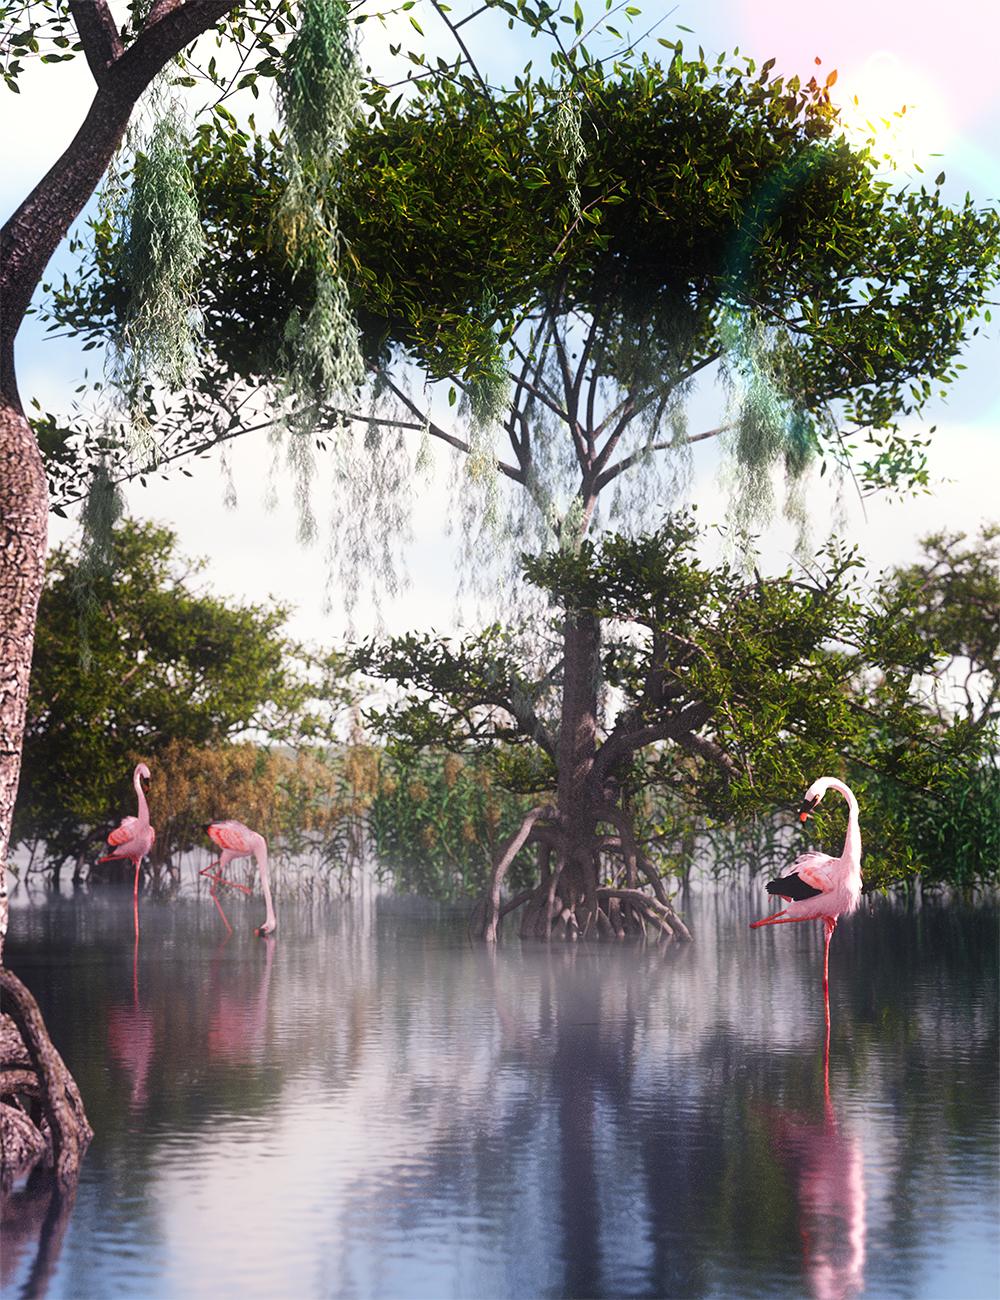 Spanish Moss by: MartinJFrost, 3D Models by Daz 3D